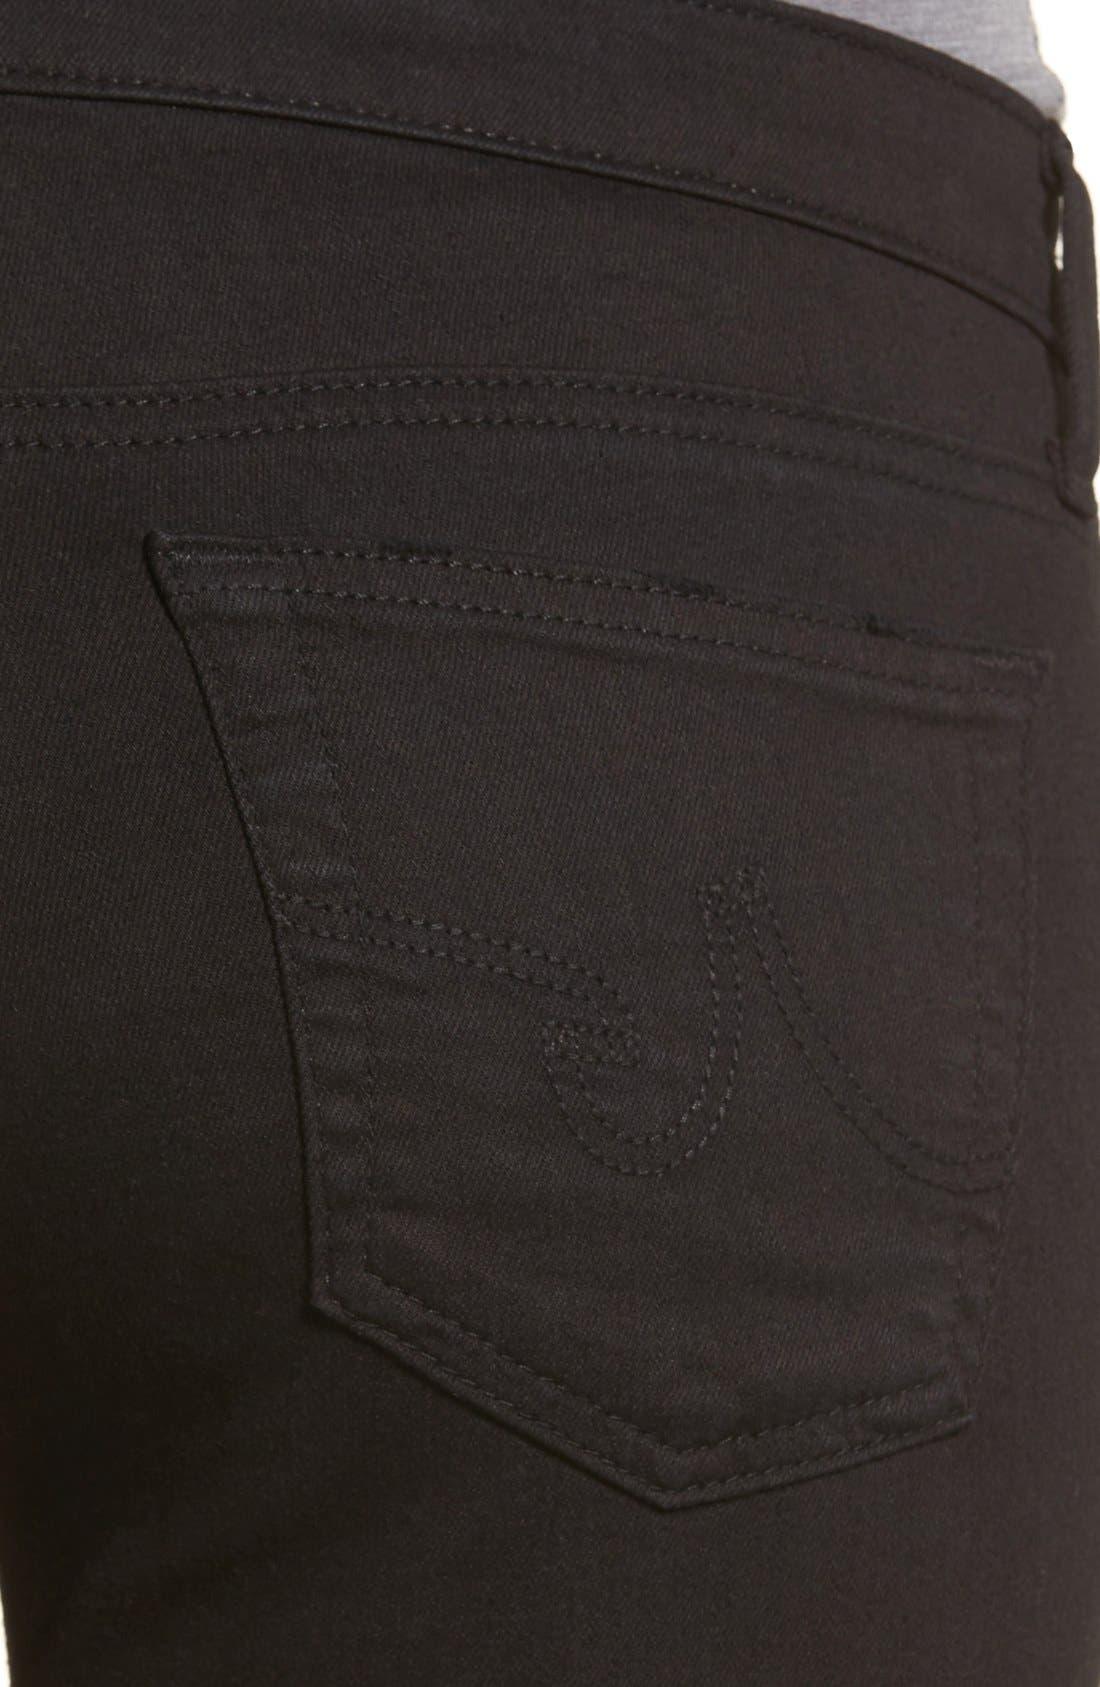 'The Legging' Ankle Super Skinny Jeans,                             Alternate thumbnail 25, color,